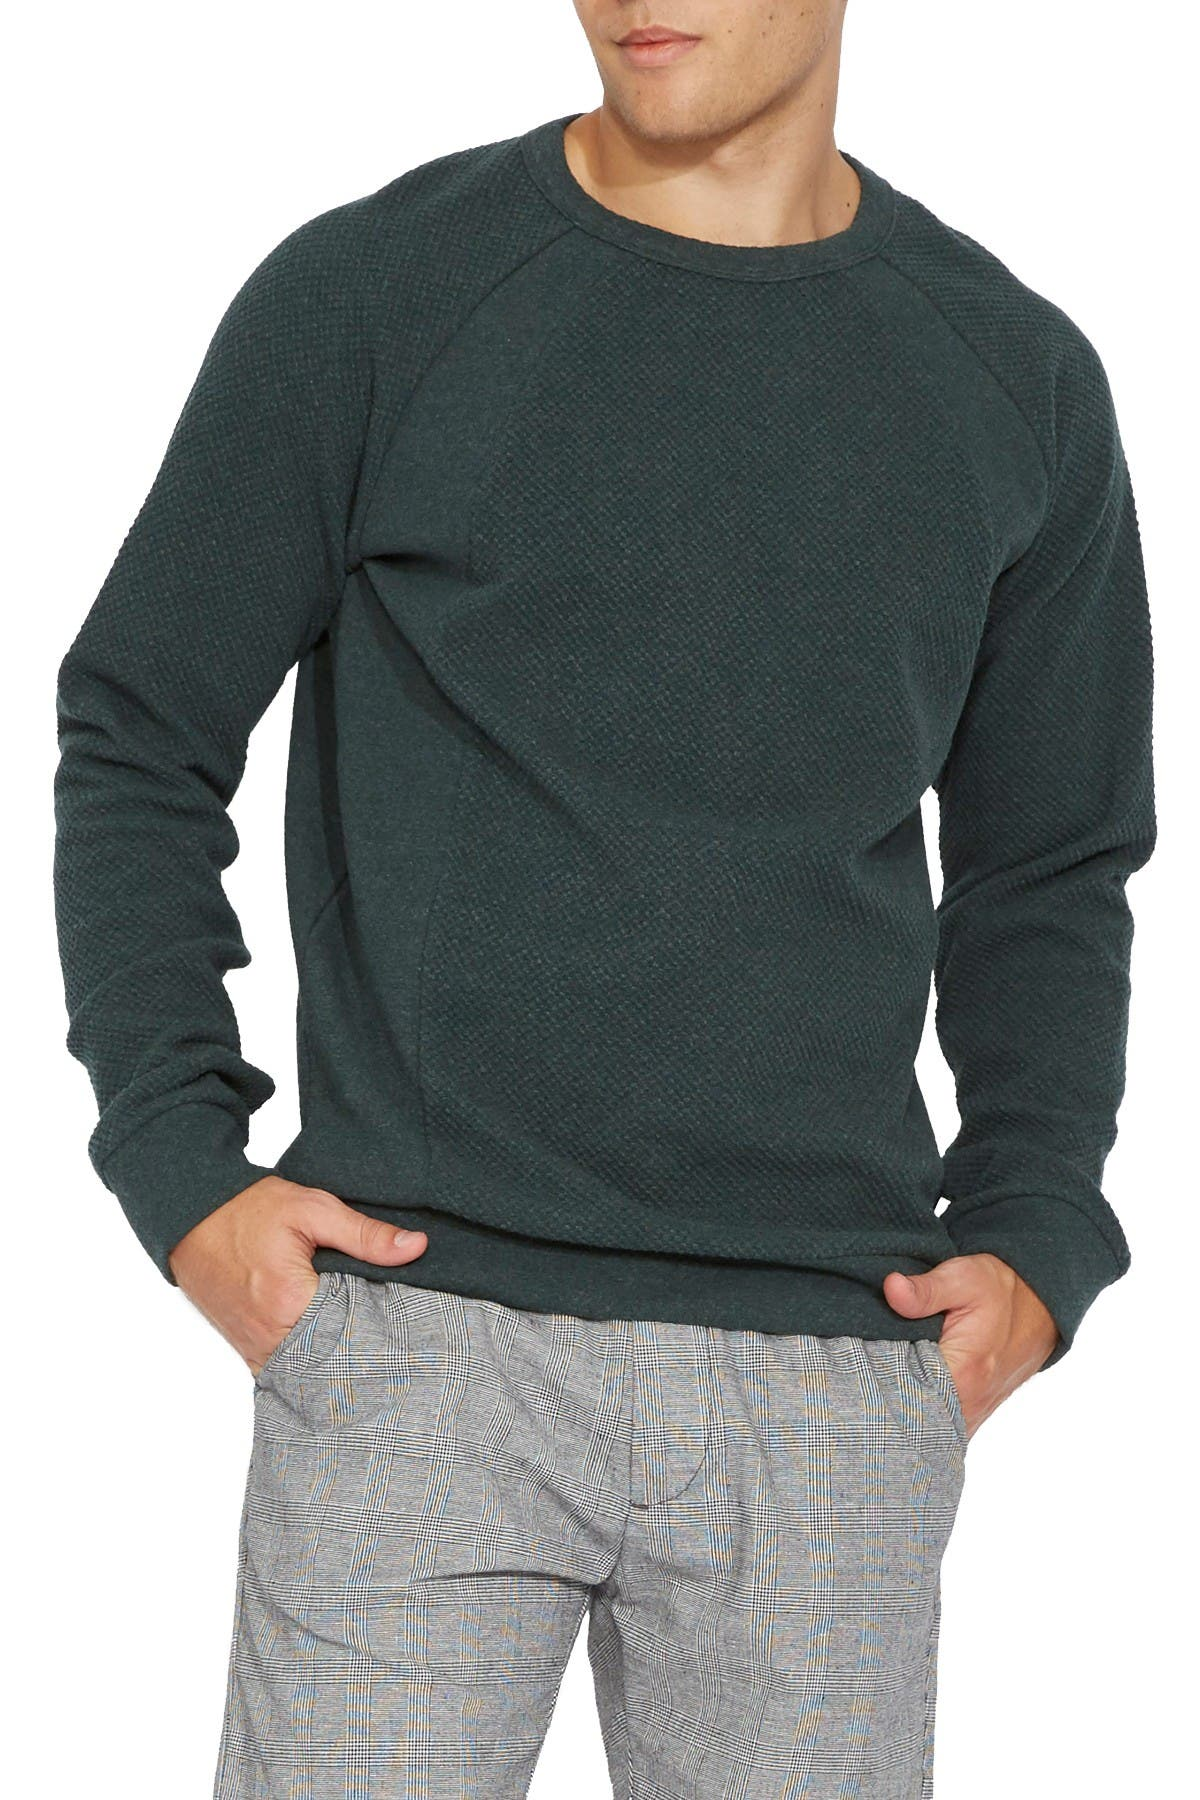 Image of Civil Society Maxson Waffle Knit Pullover